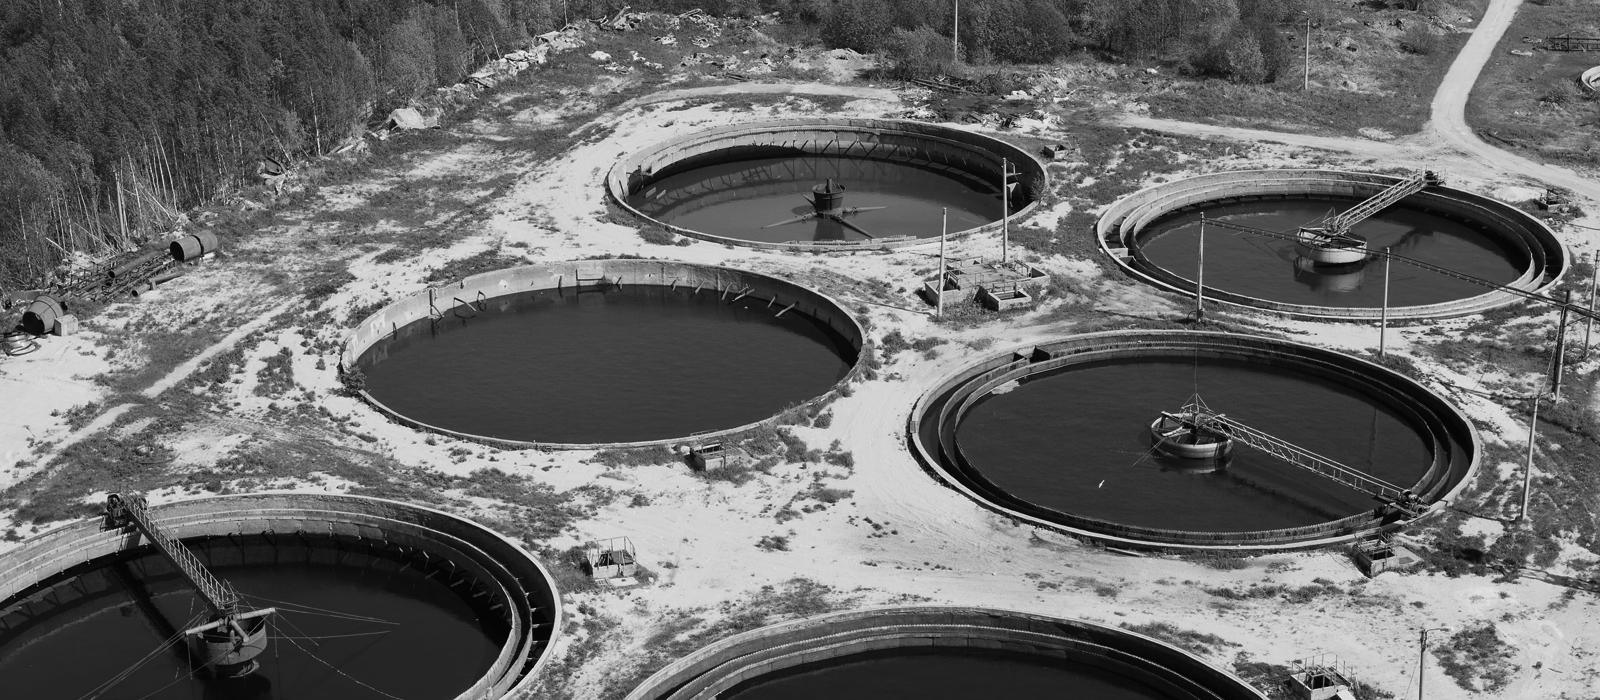 Wastewater plants